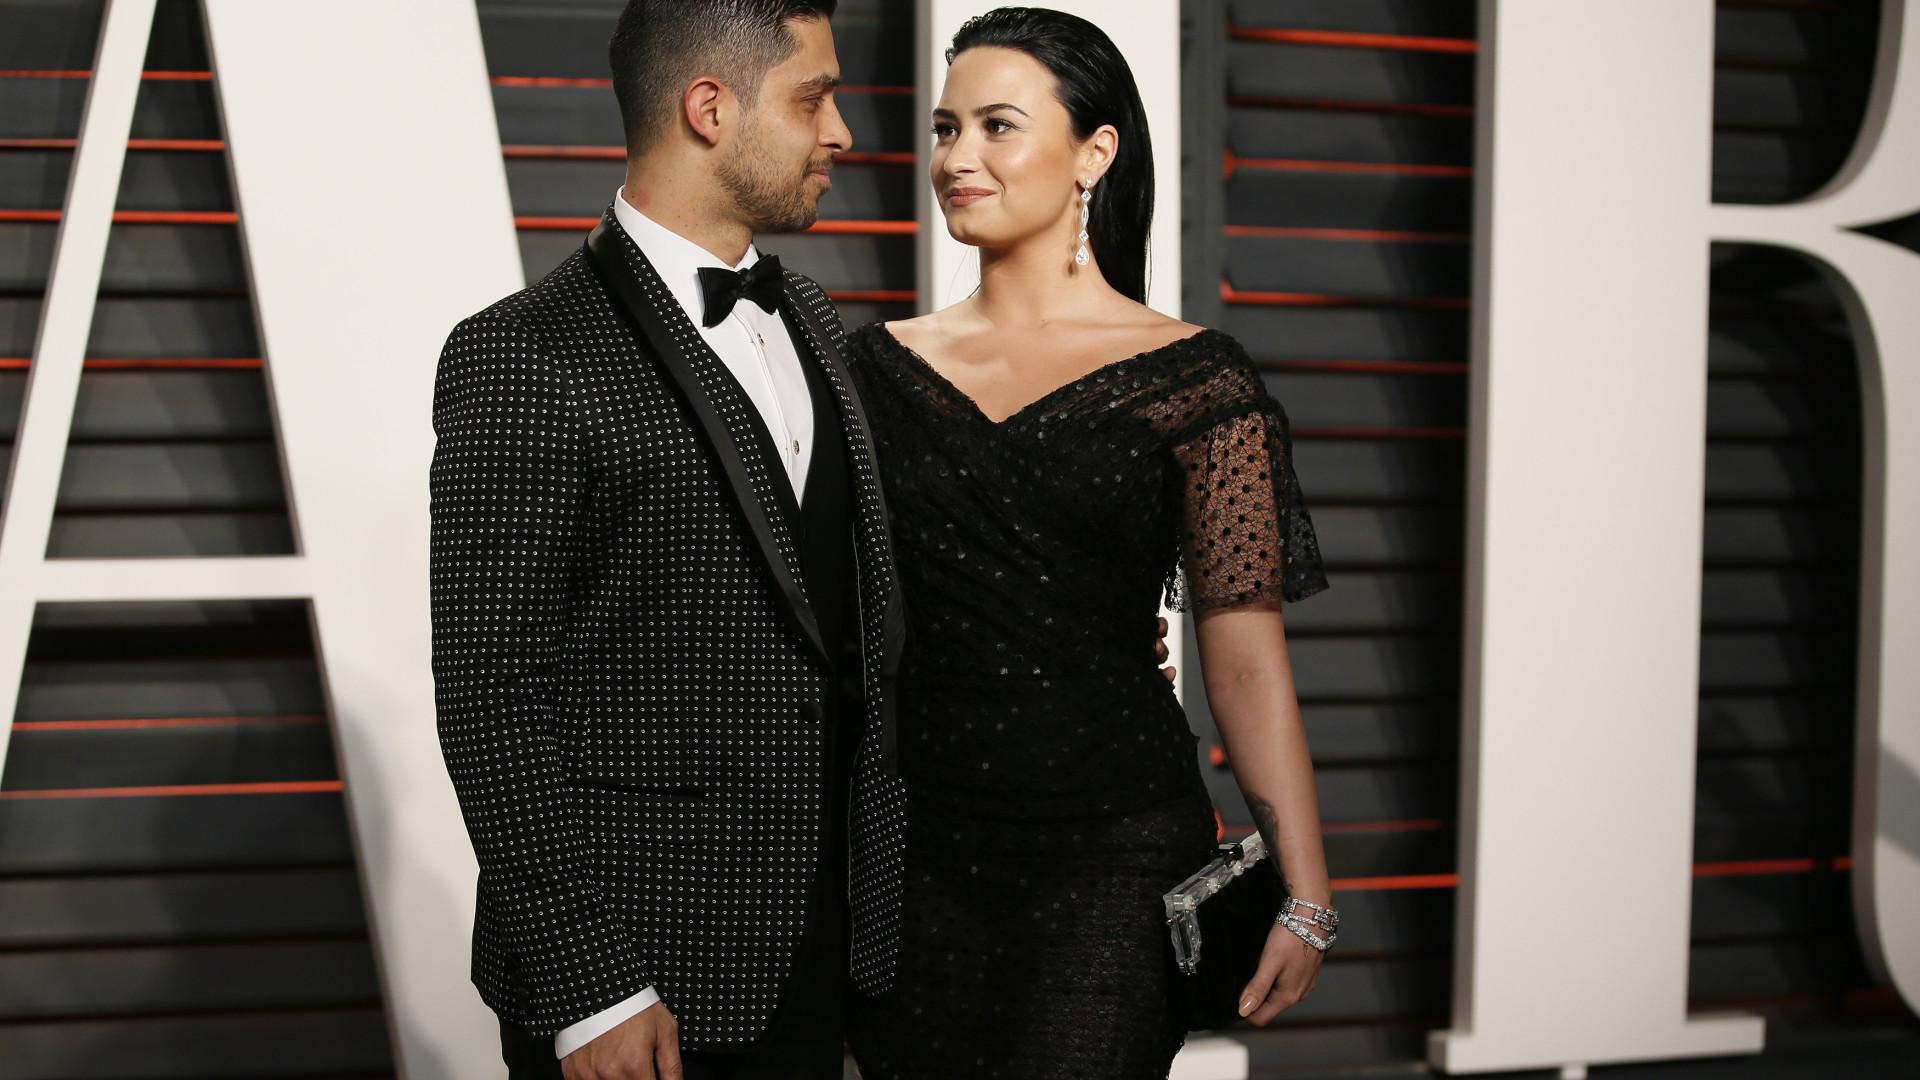 Internada, Demi Lovato tem sido visitada pelo ex-namorado